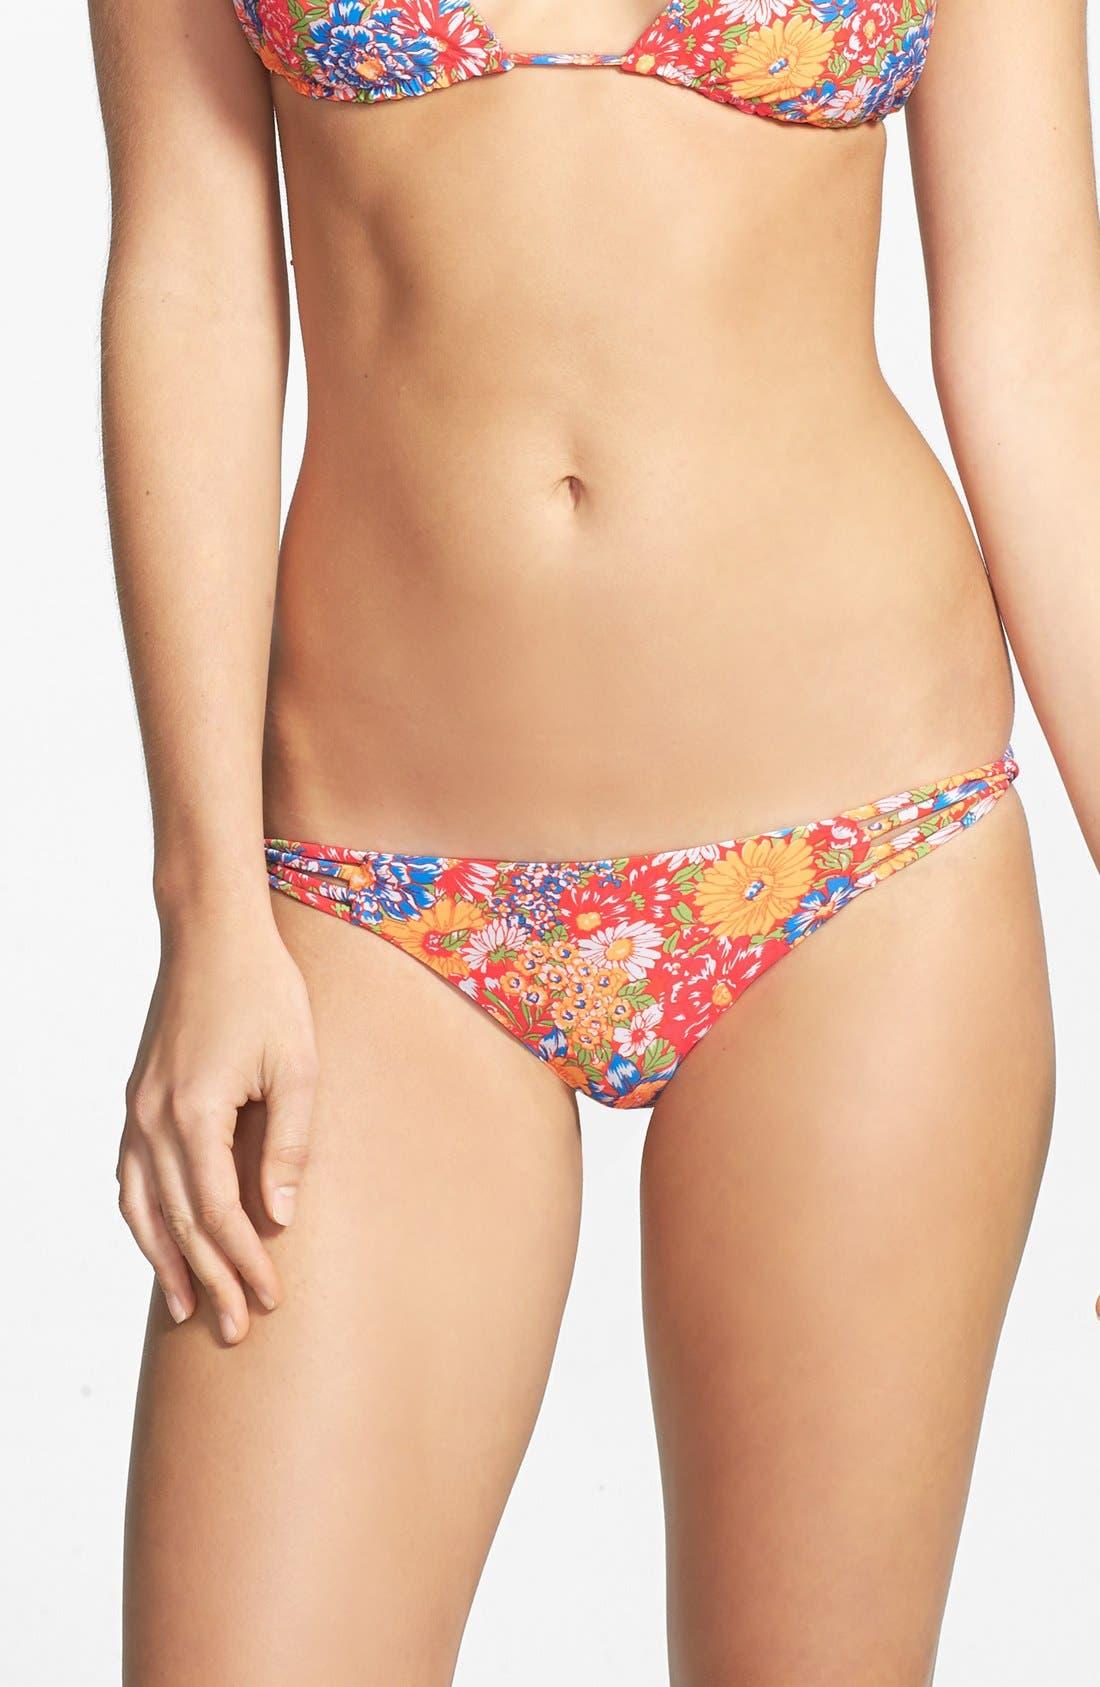 Alternate Image 1 Selected - O'Neill 'Citrus Floral' Reversible Strappy Twist Bikini Bottoms